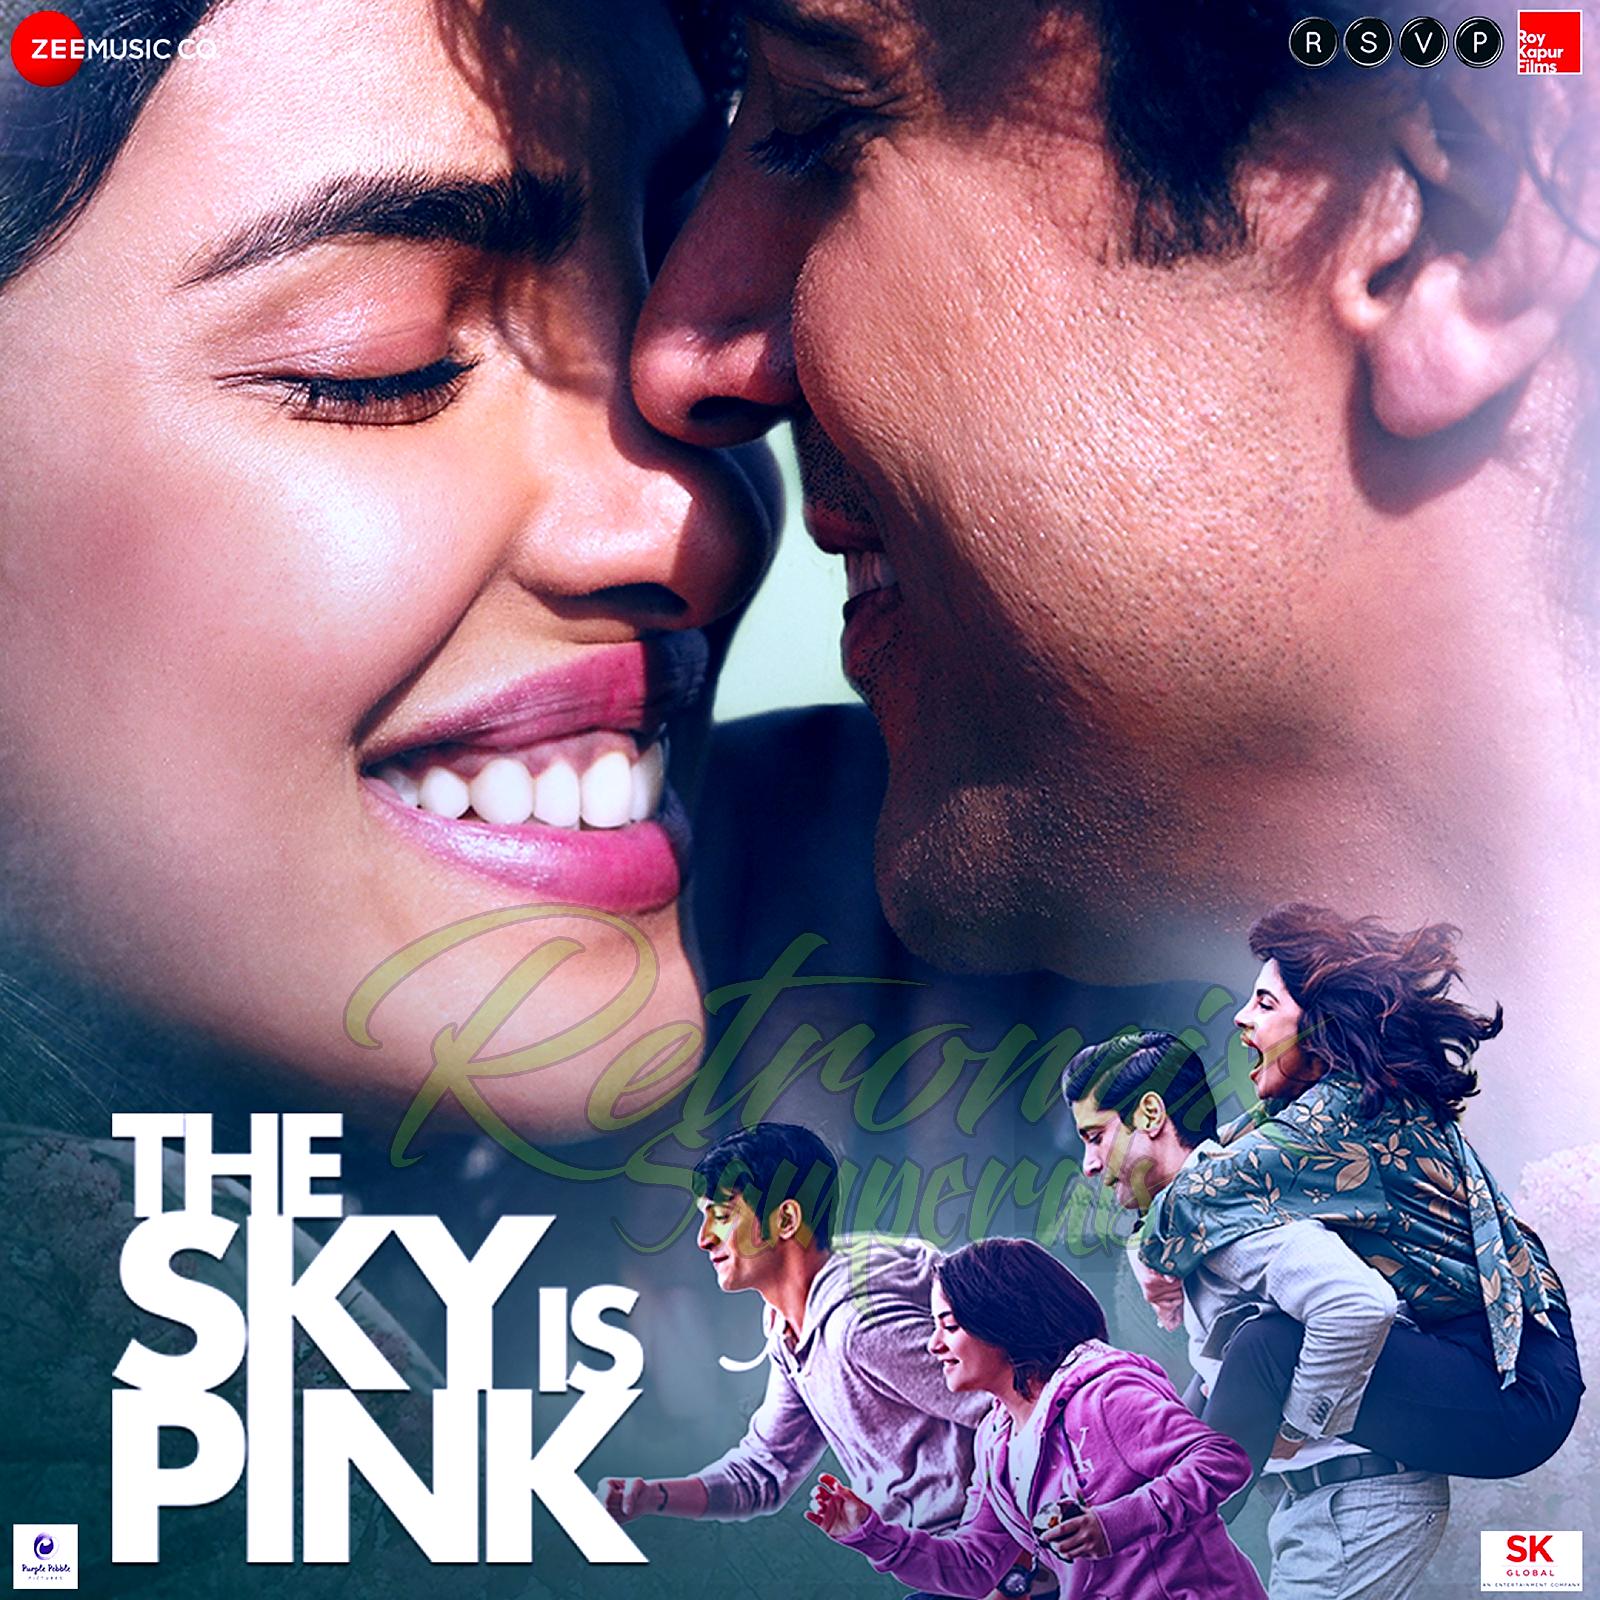 Sky Werbung Song 2019